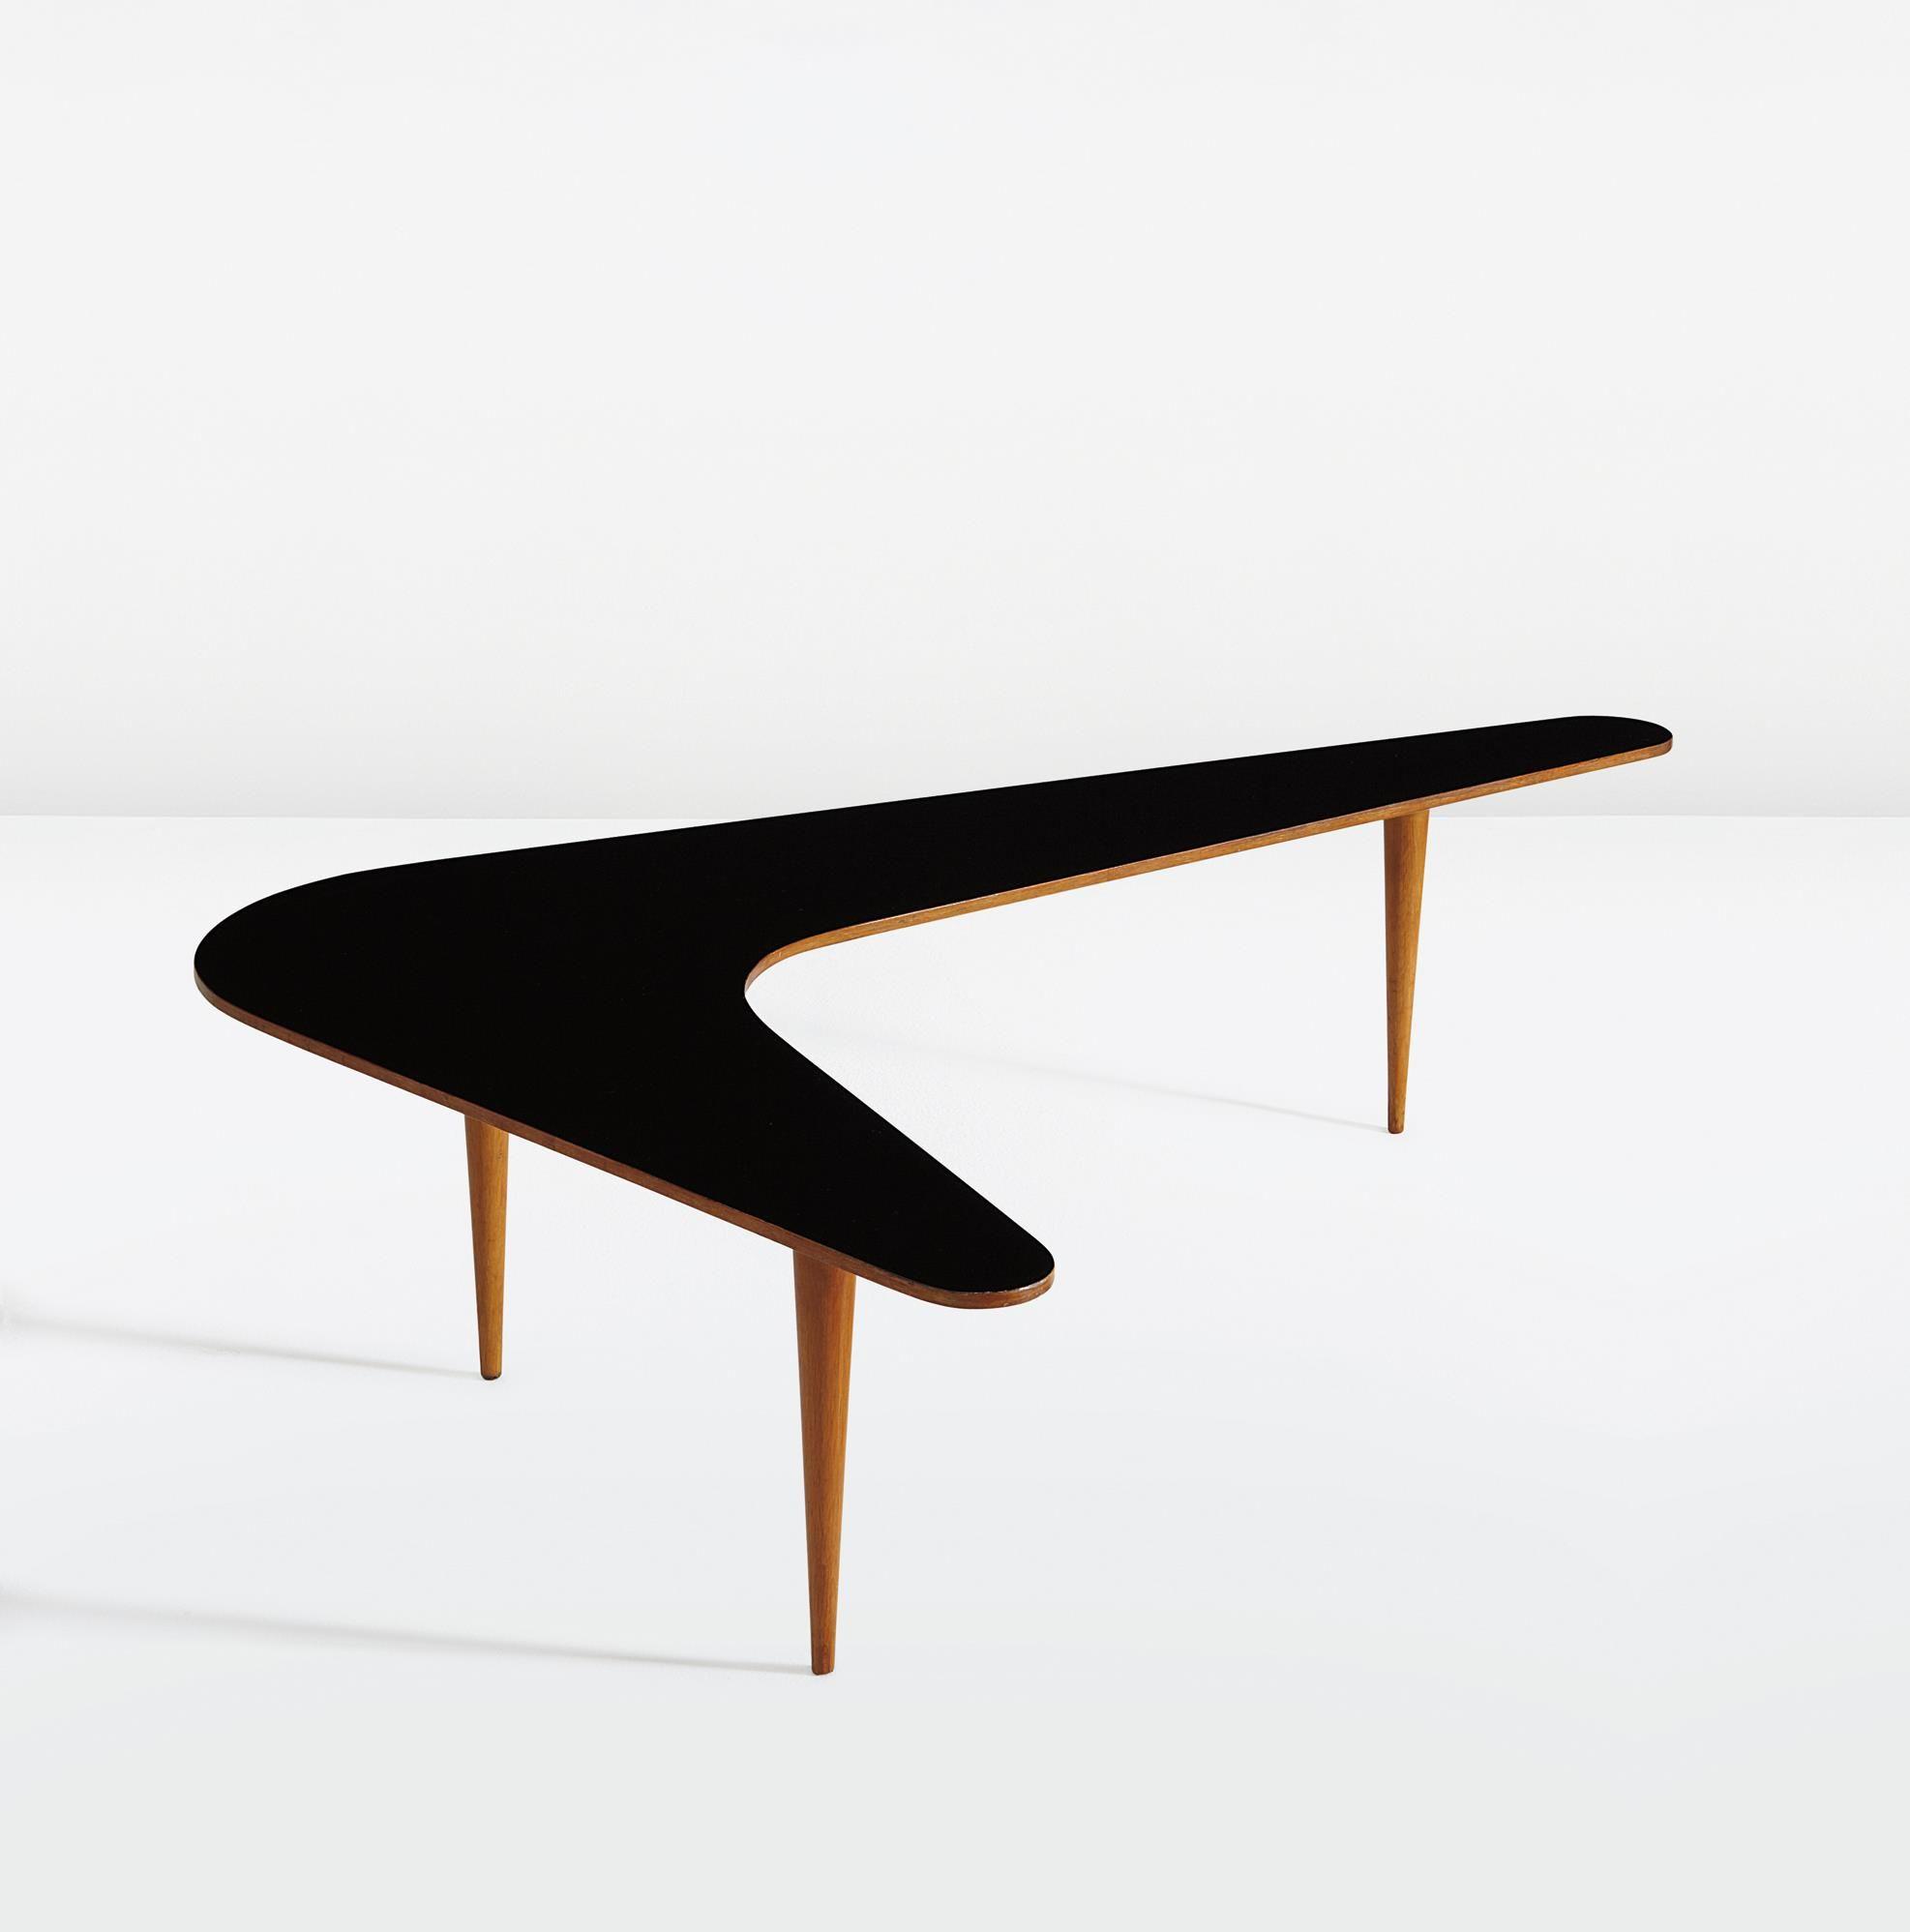 Jean royre boomerang coffee table circa 1957 lacquered wood jean royre boomerang coffee table circa 1957 lacquered wood oak 13 geotapseo Choice Image